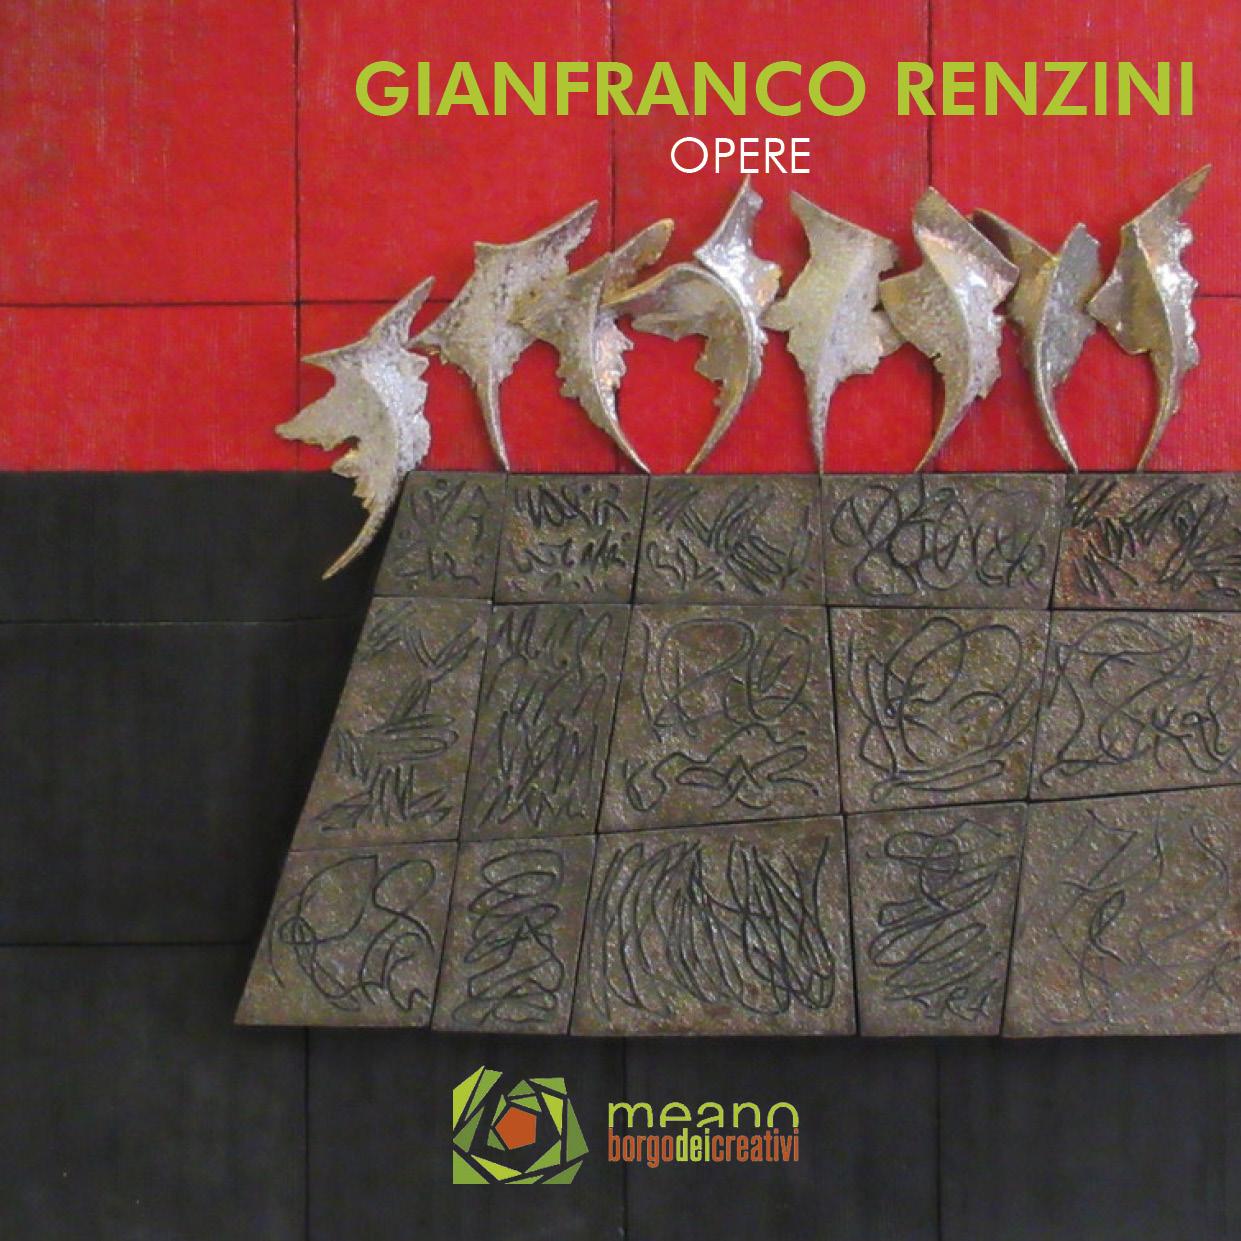 Meano - Asilo dei Creativi - Facebook - Renzini.jpg